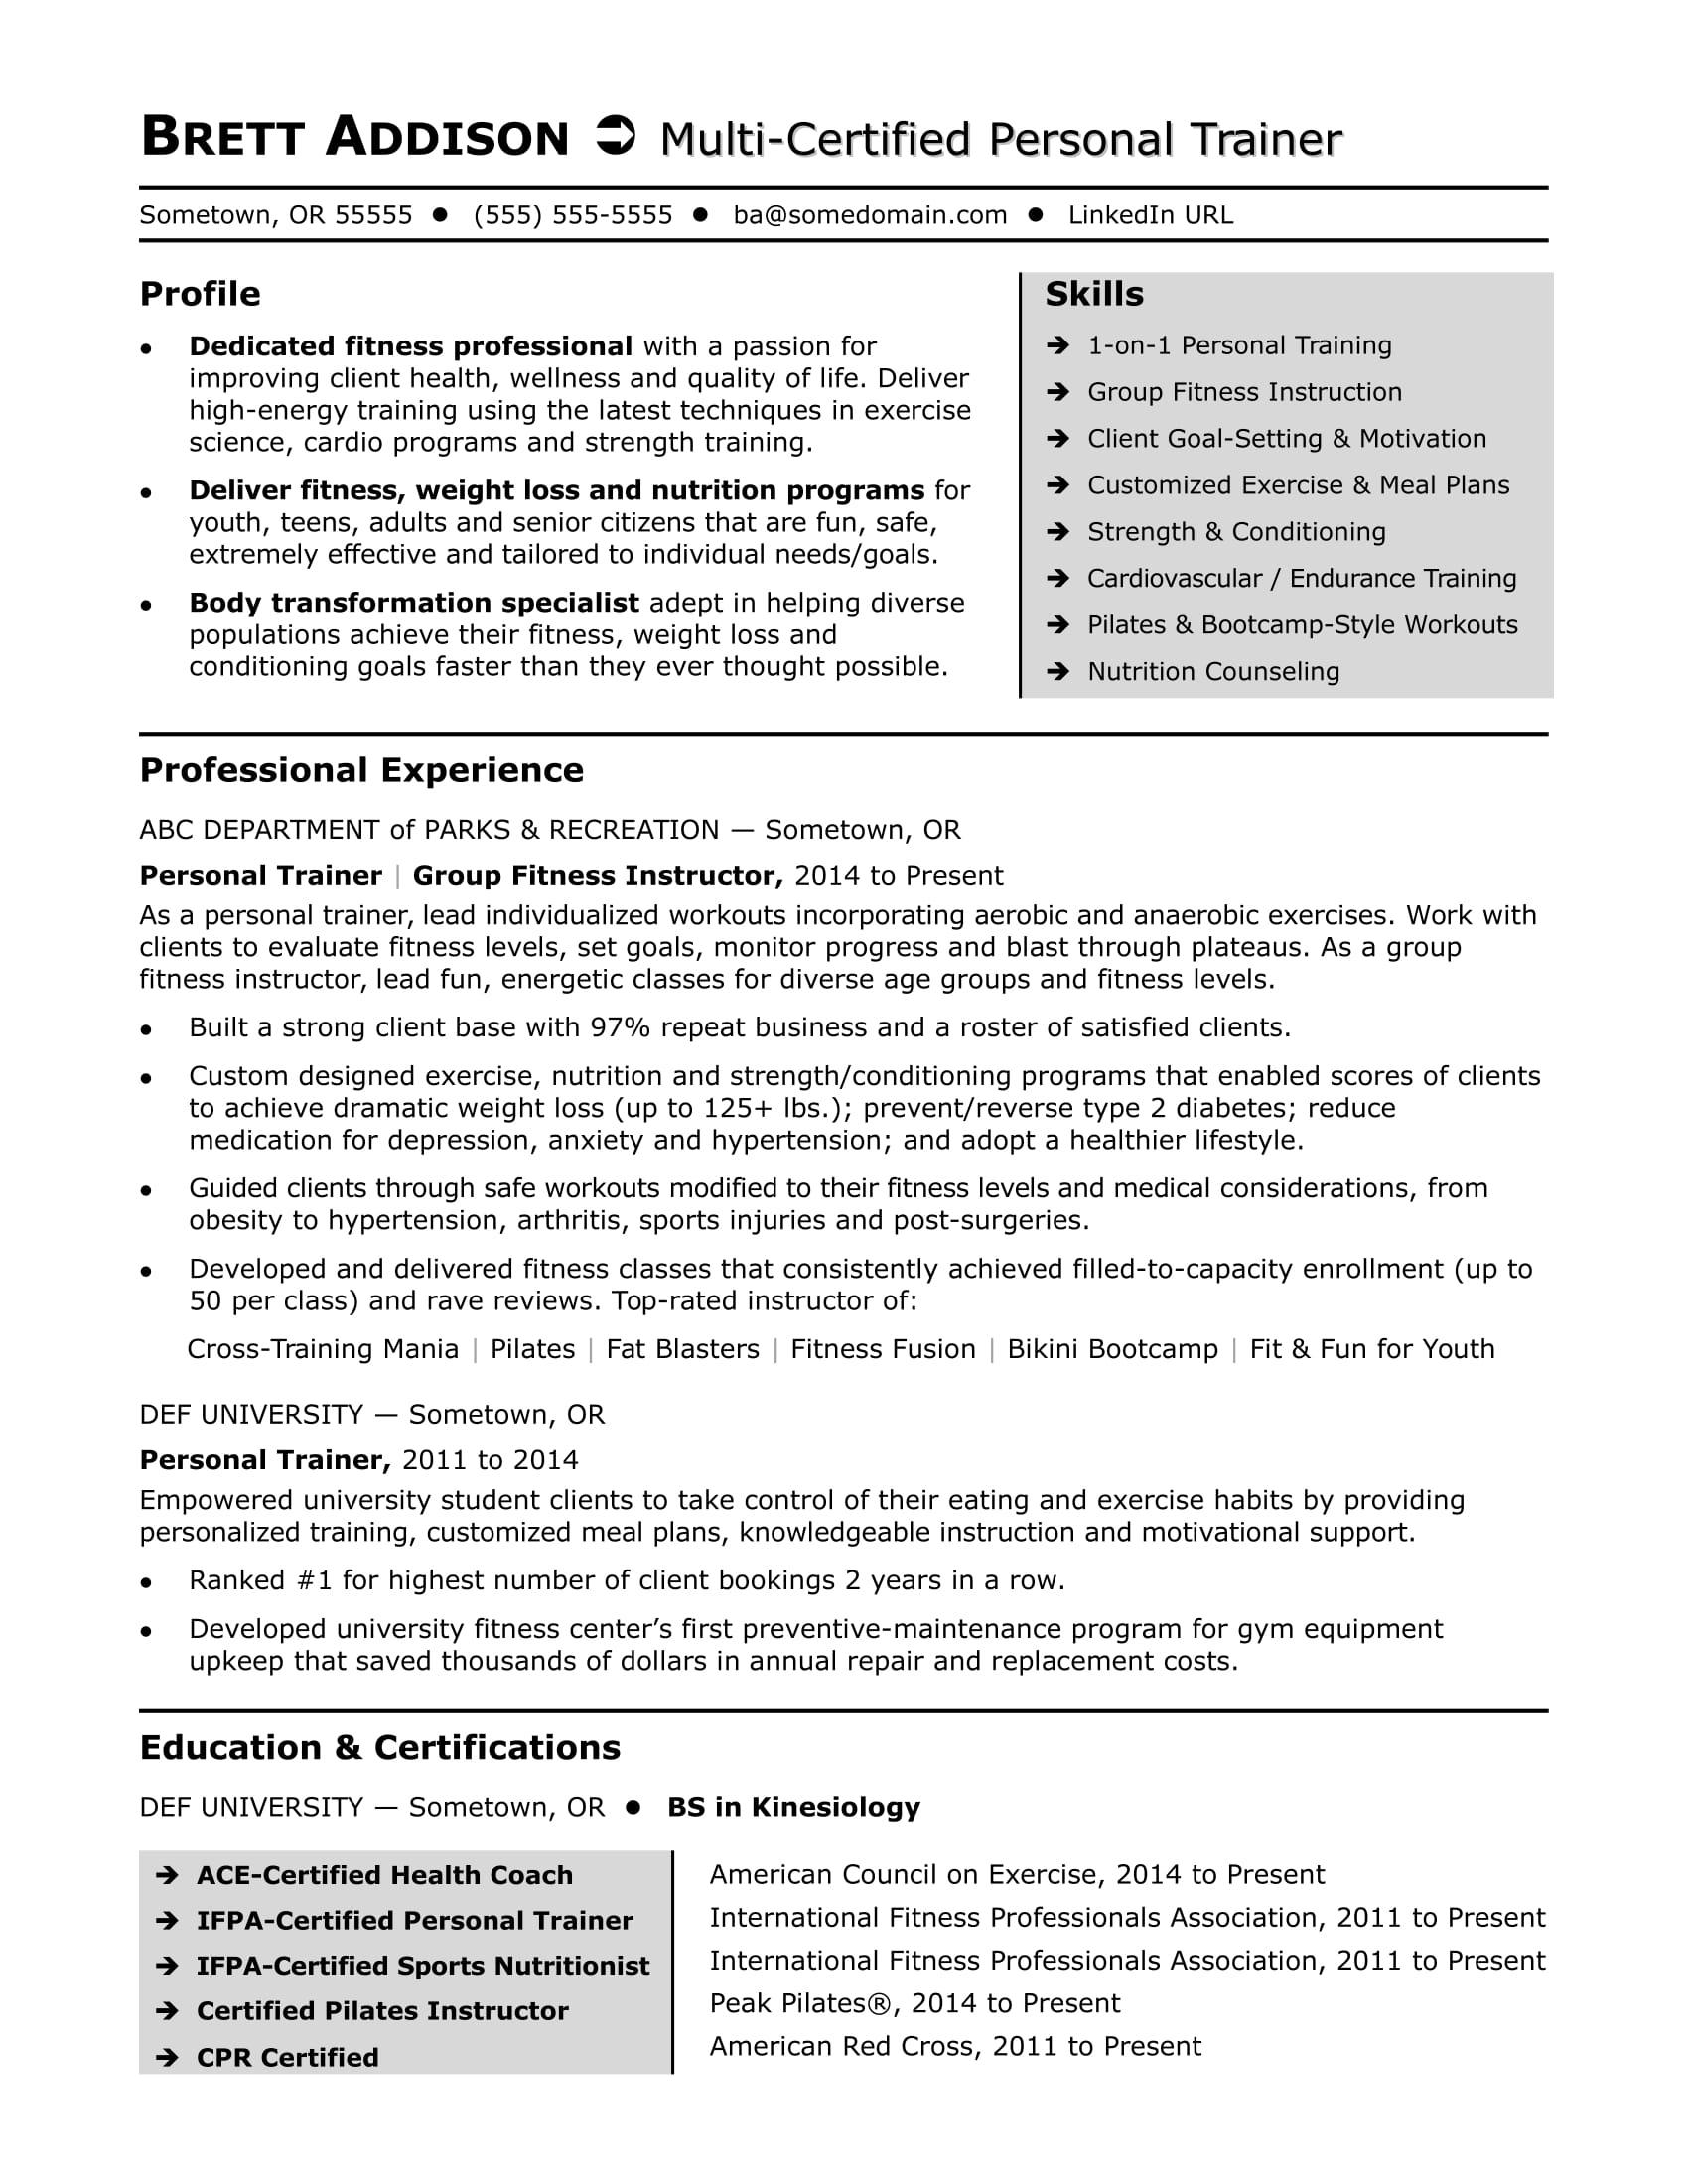 Buy Resume Paper Chicago  University essay service